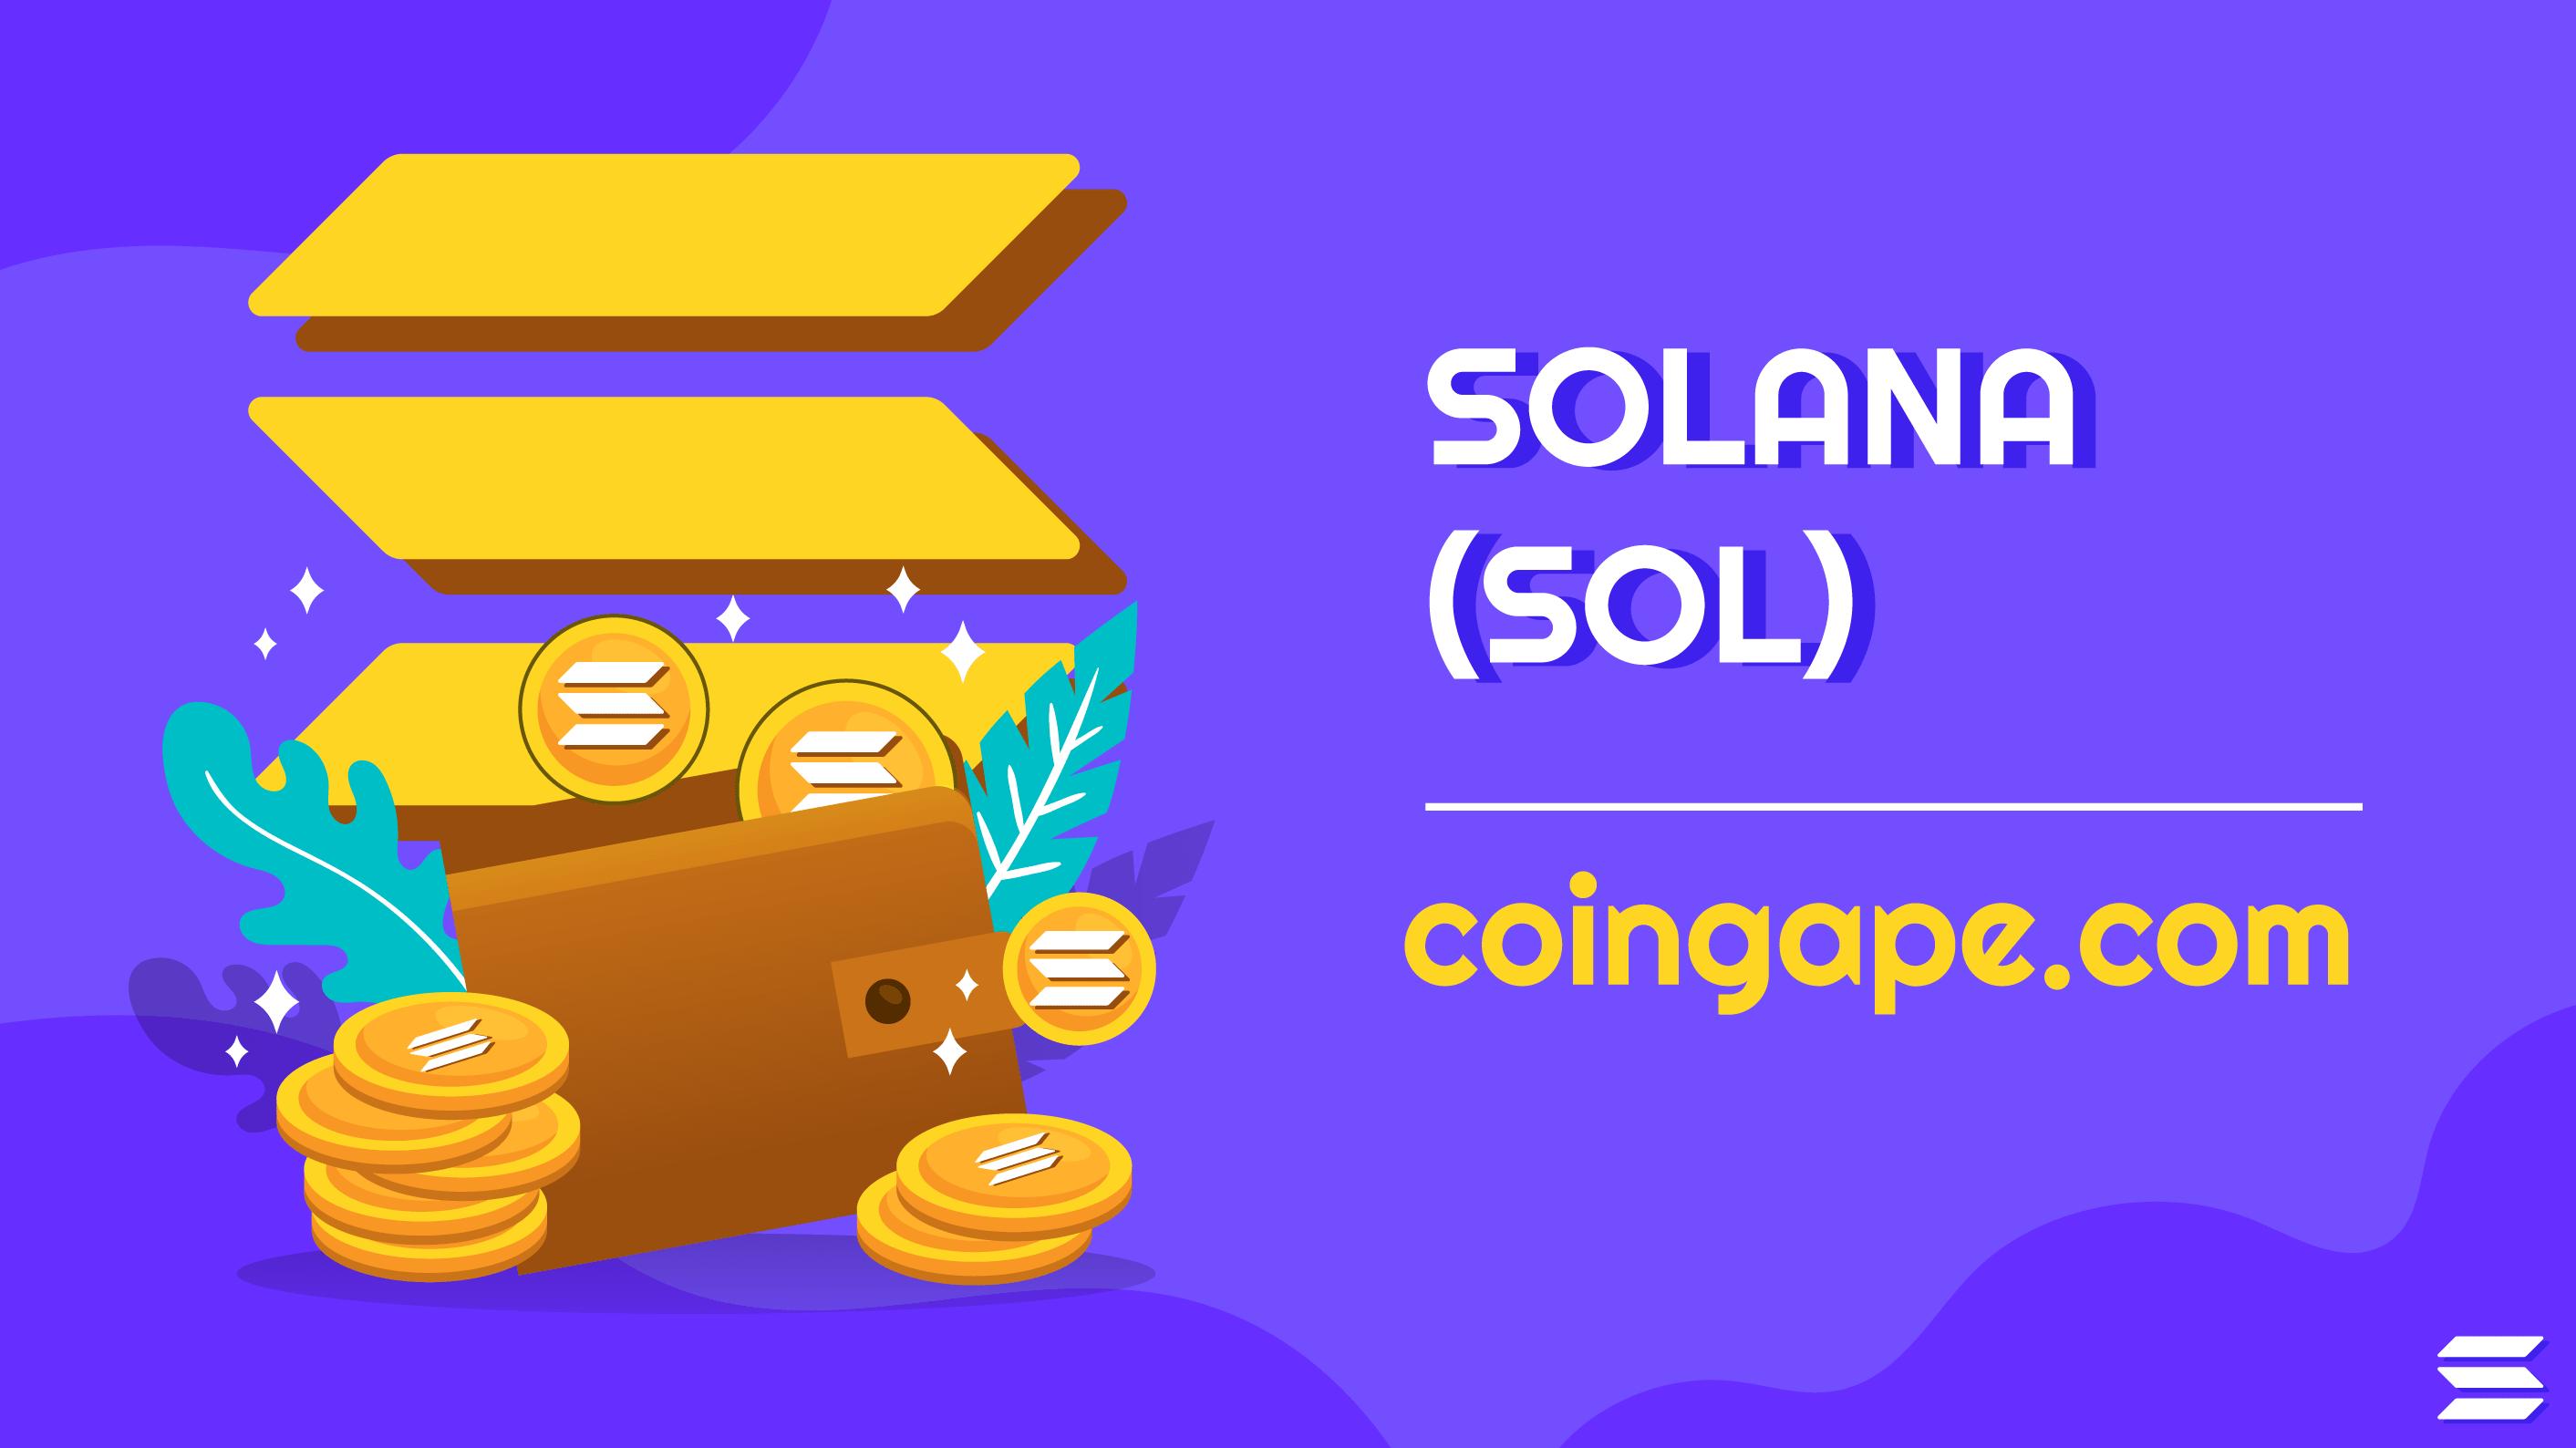 Solana (SOL)